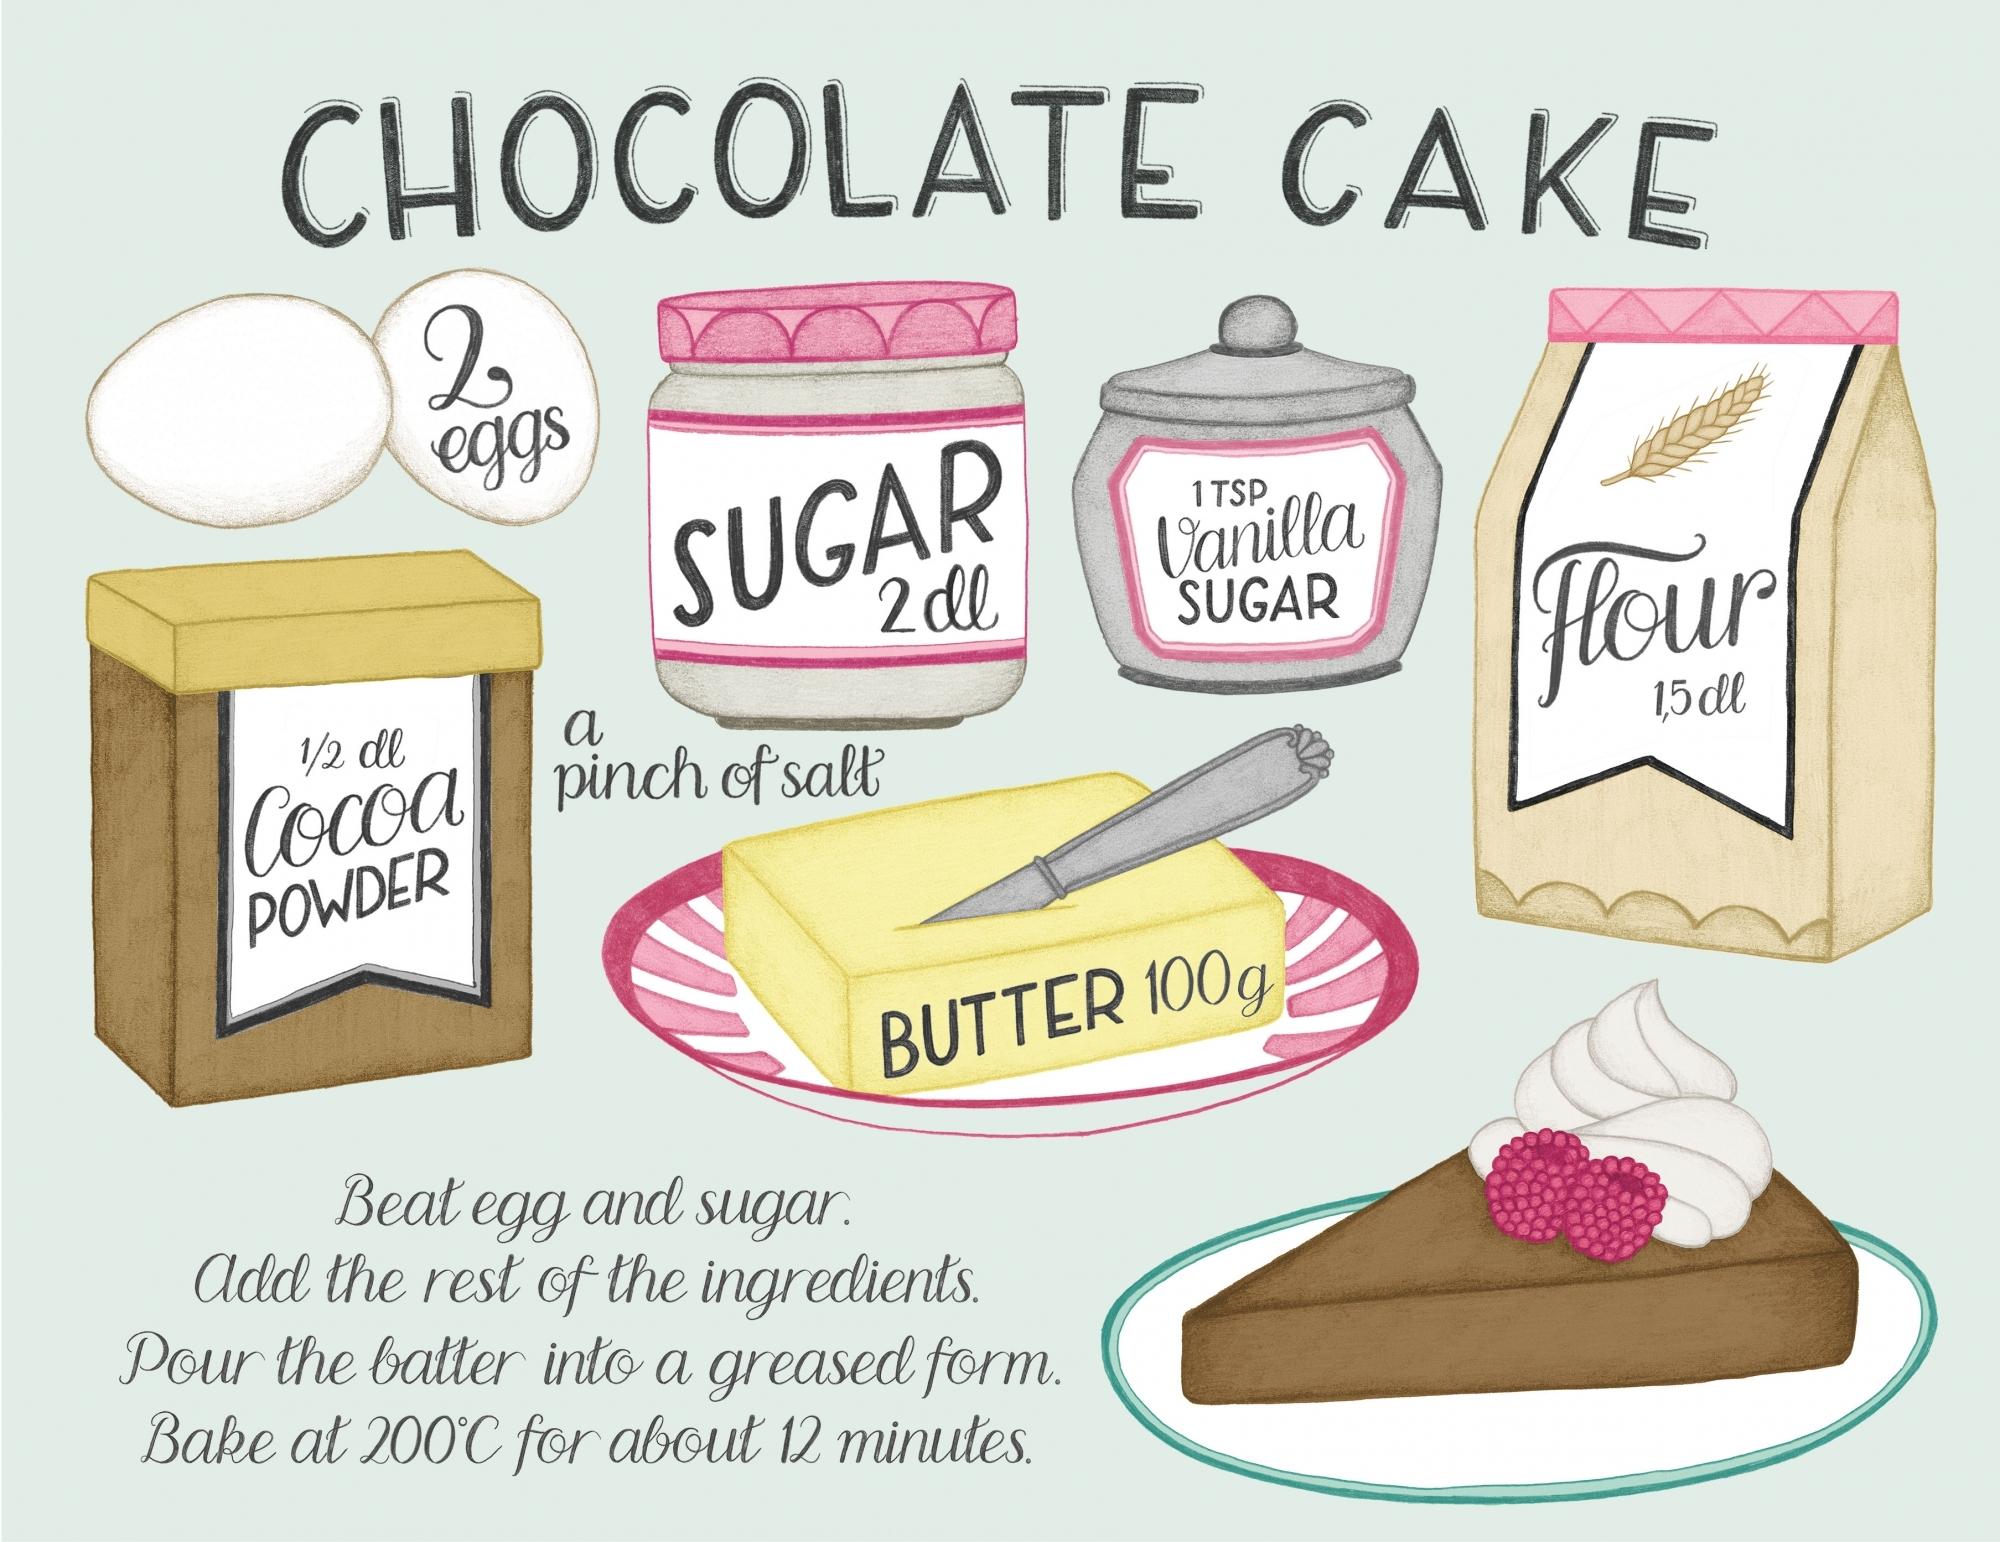 Chocolate cake recipe illustration by  Tove Larris .